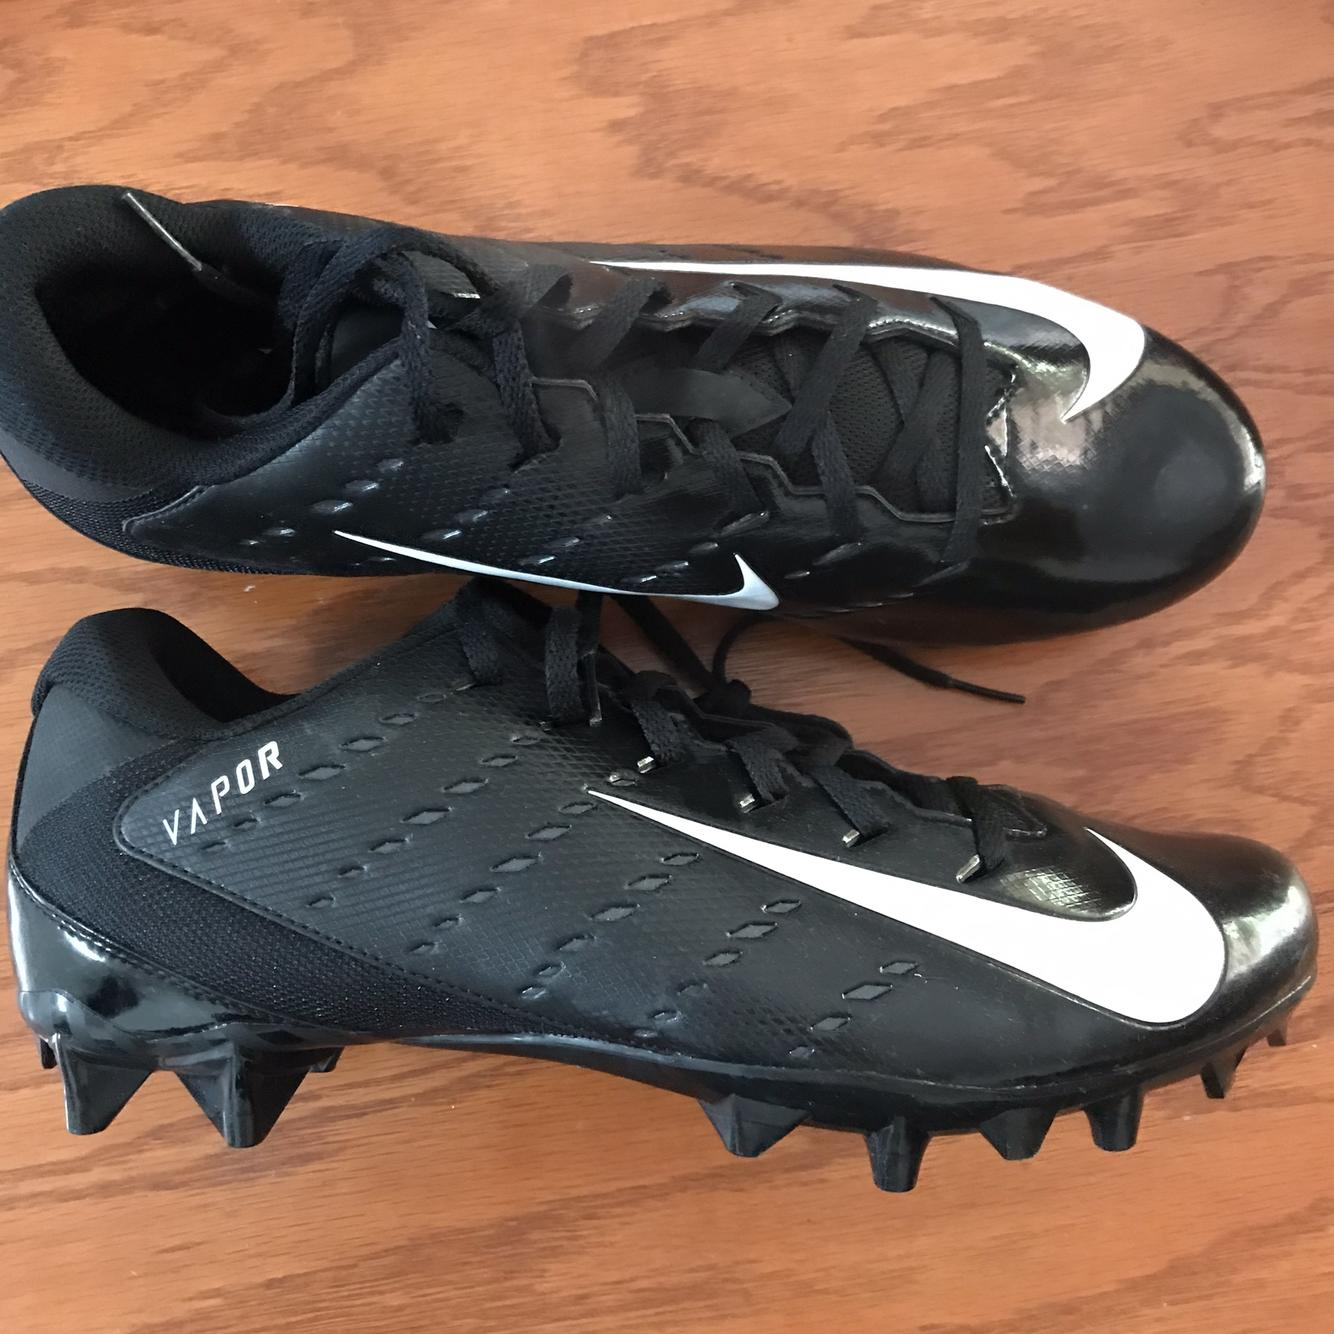 Nike New Size 11 Vapor   Football Cleats